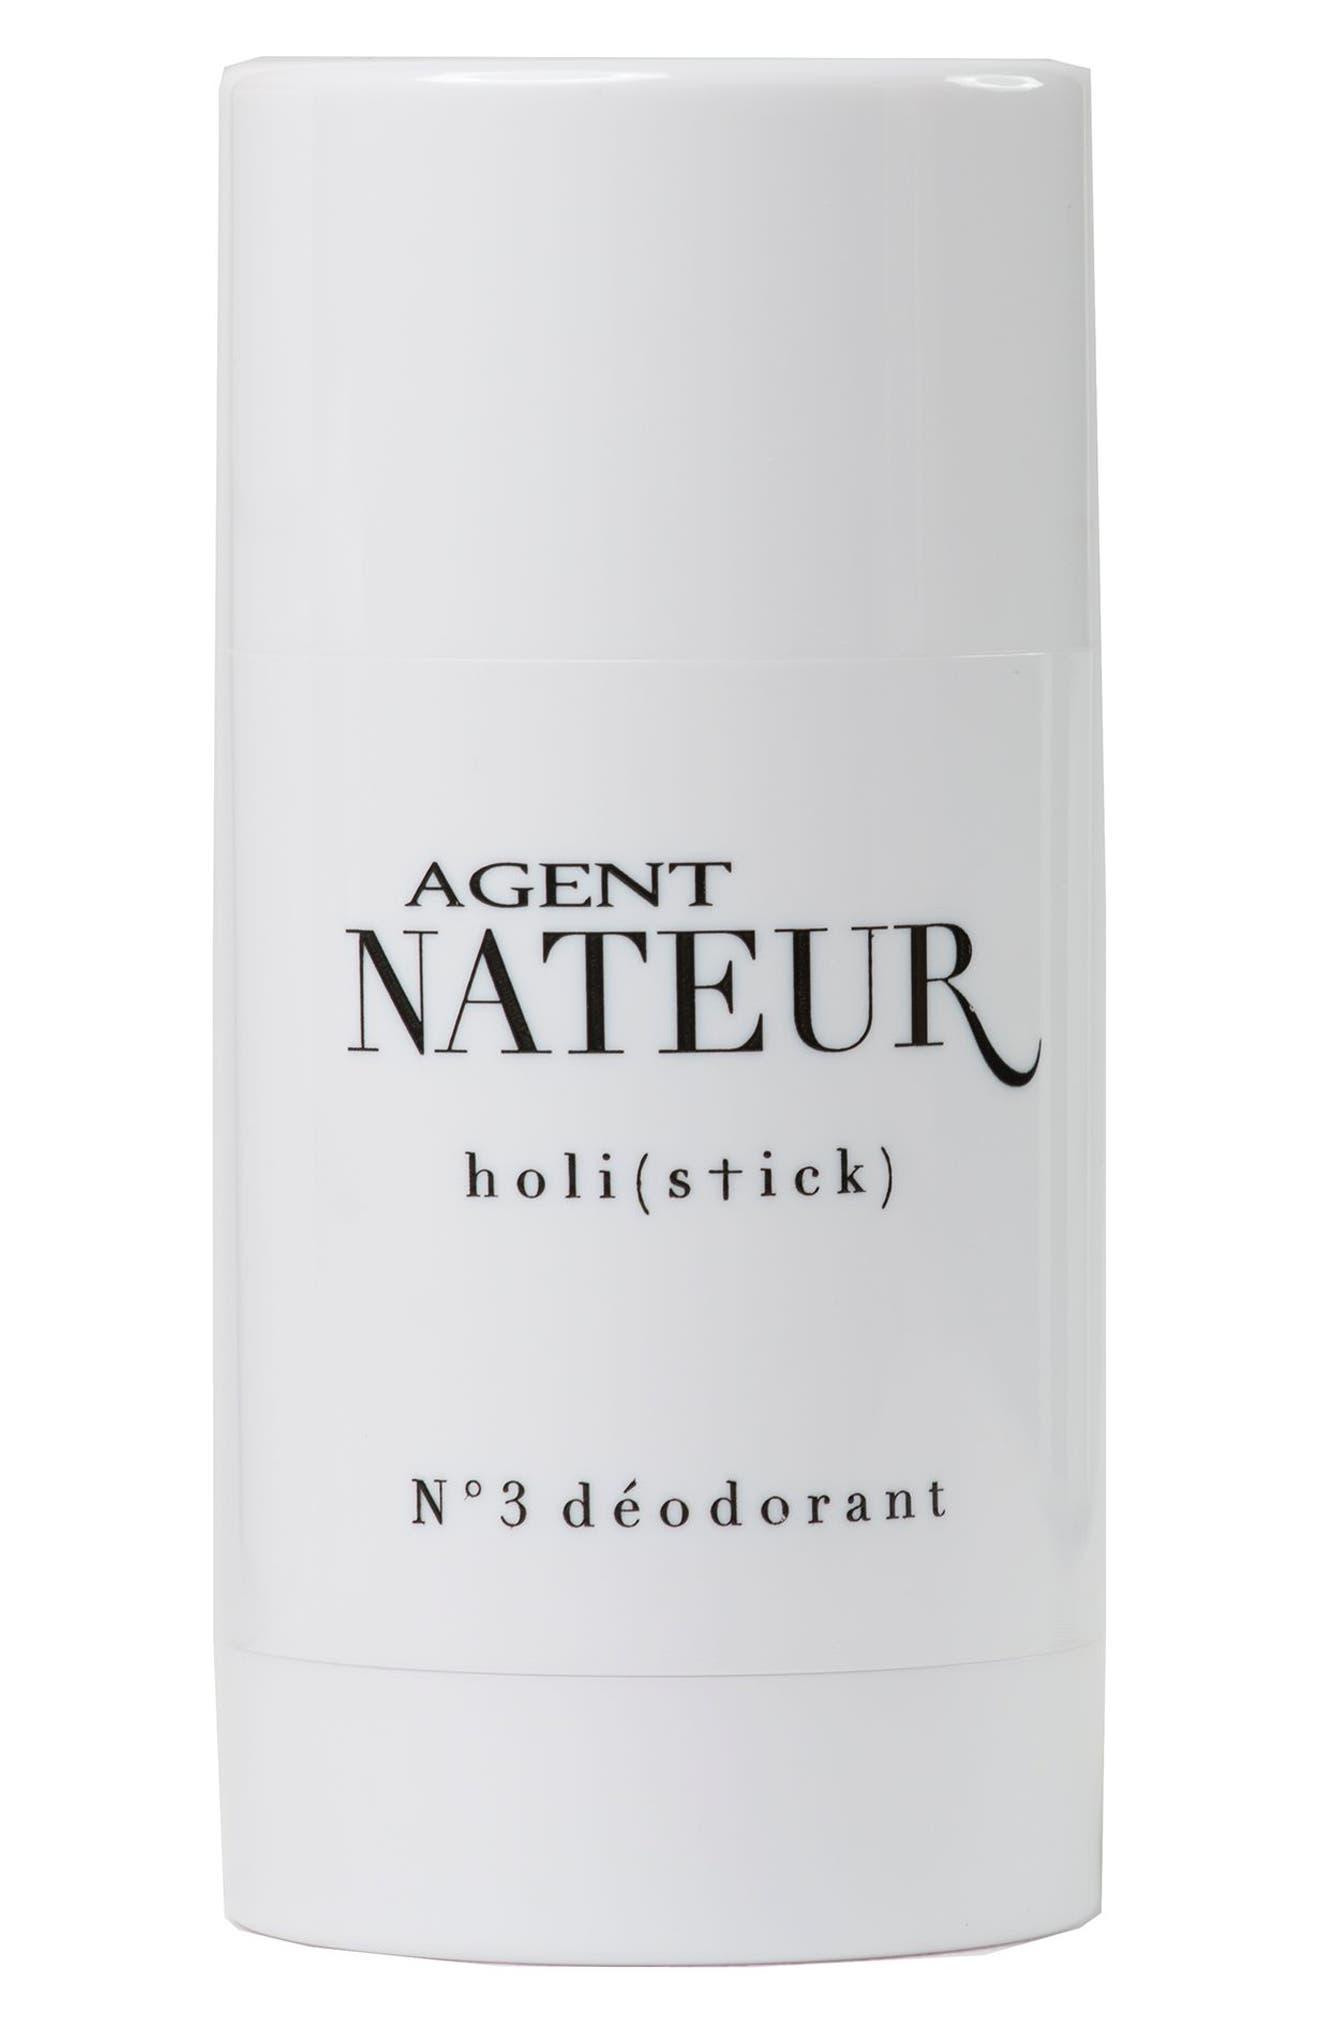 Agent Nateur Holi(stick)